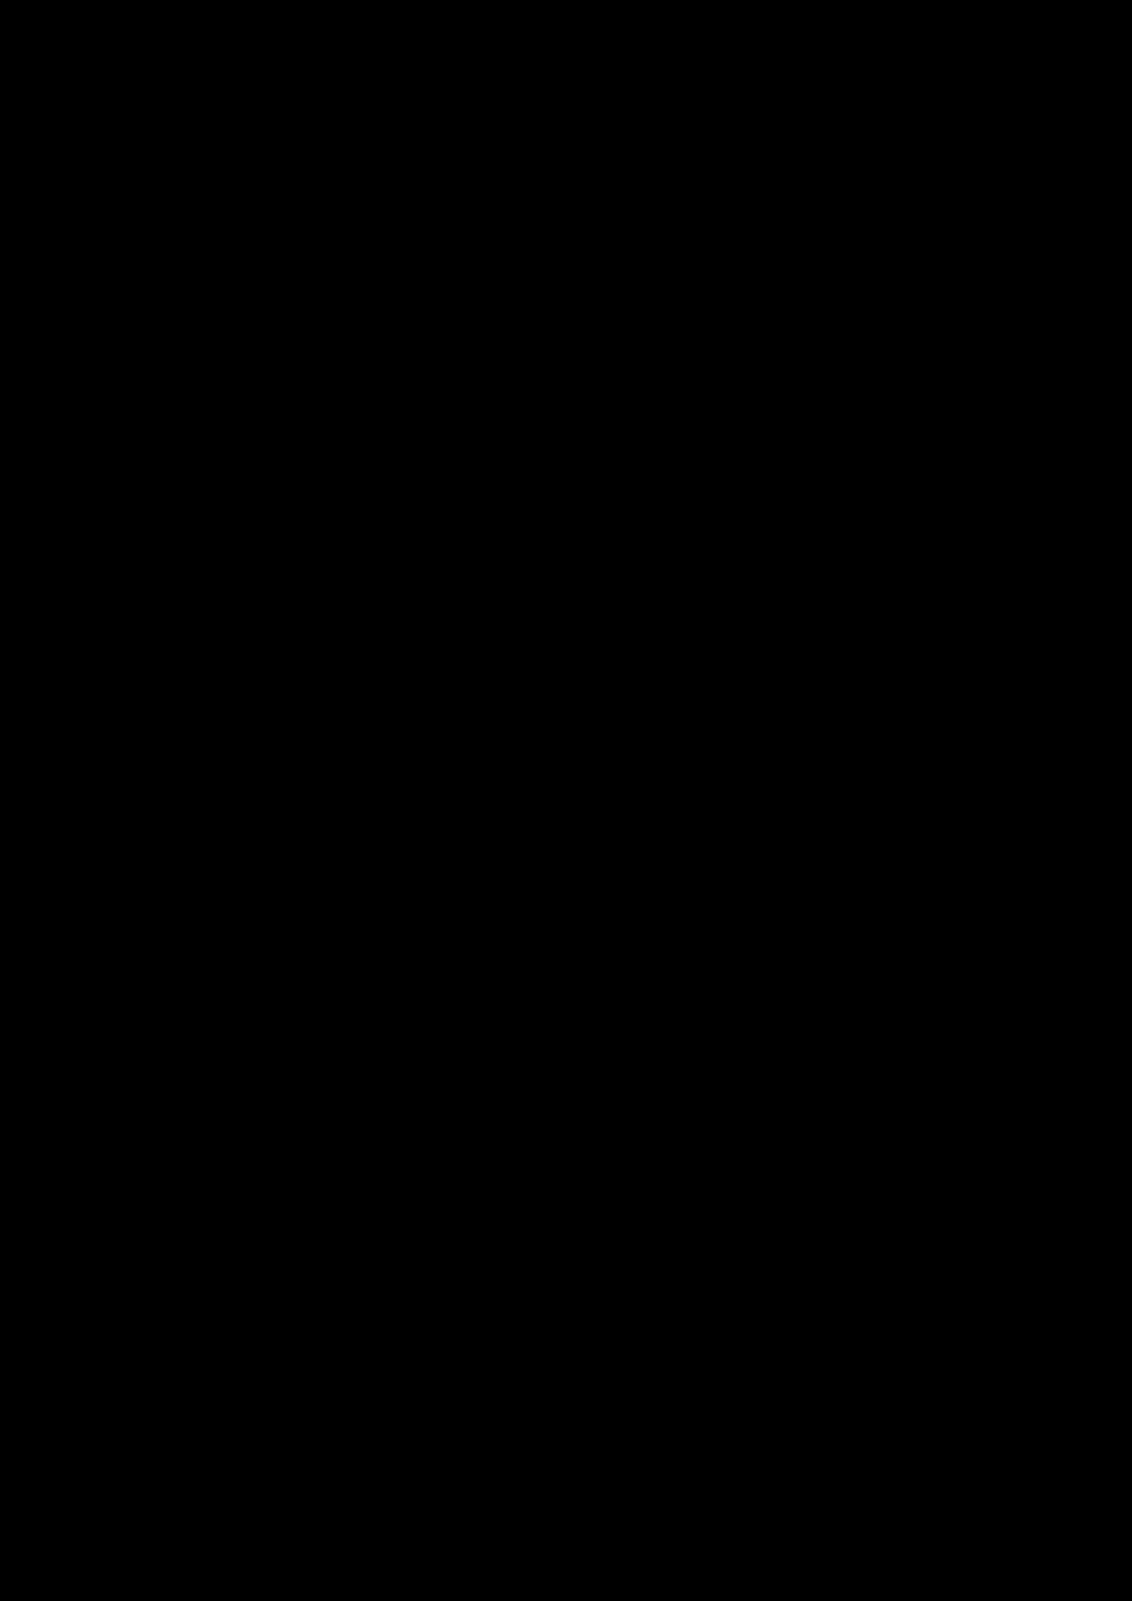 Ten lyubvi slide, Image 48